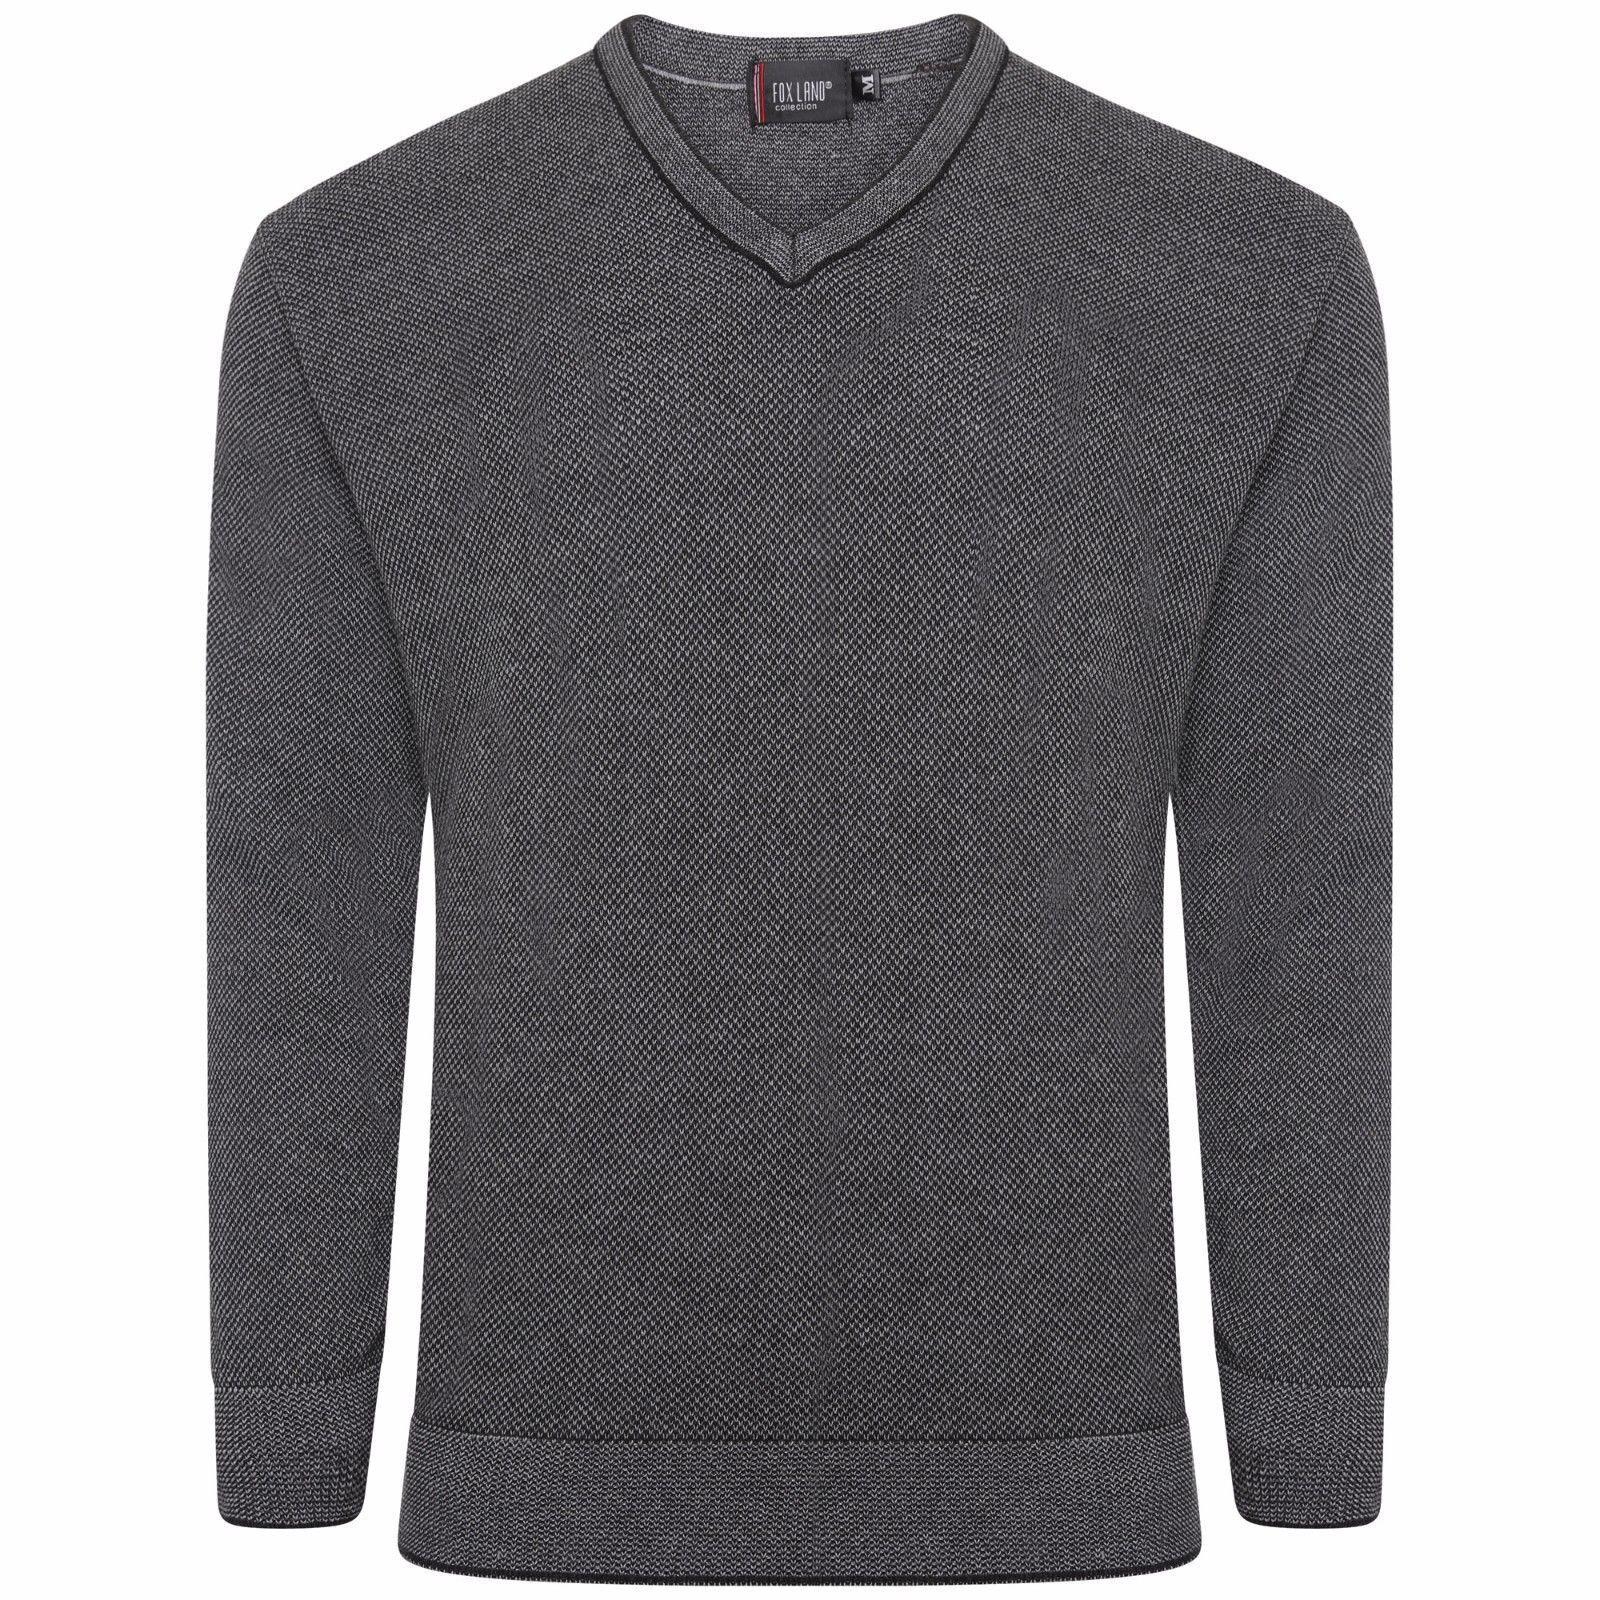 Charcoal / V-Neck Sweatshirt Uniform Knit Wear UK